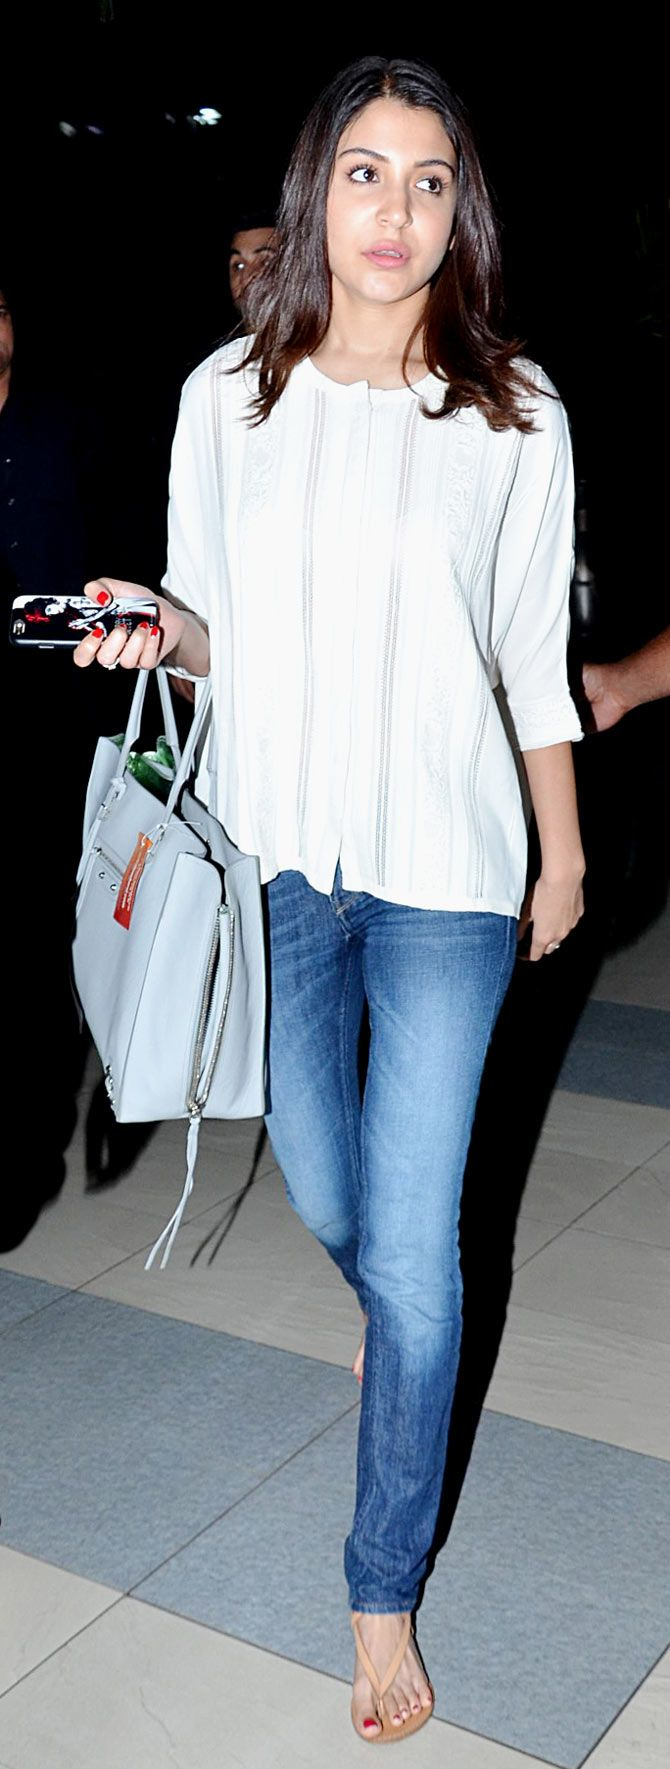 Anushka Sharma at the Mumbai airport.